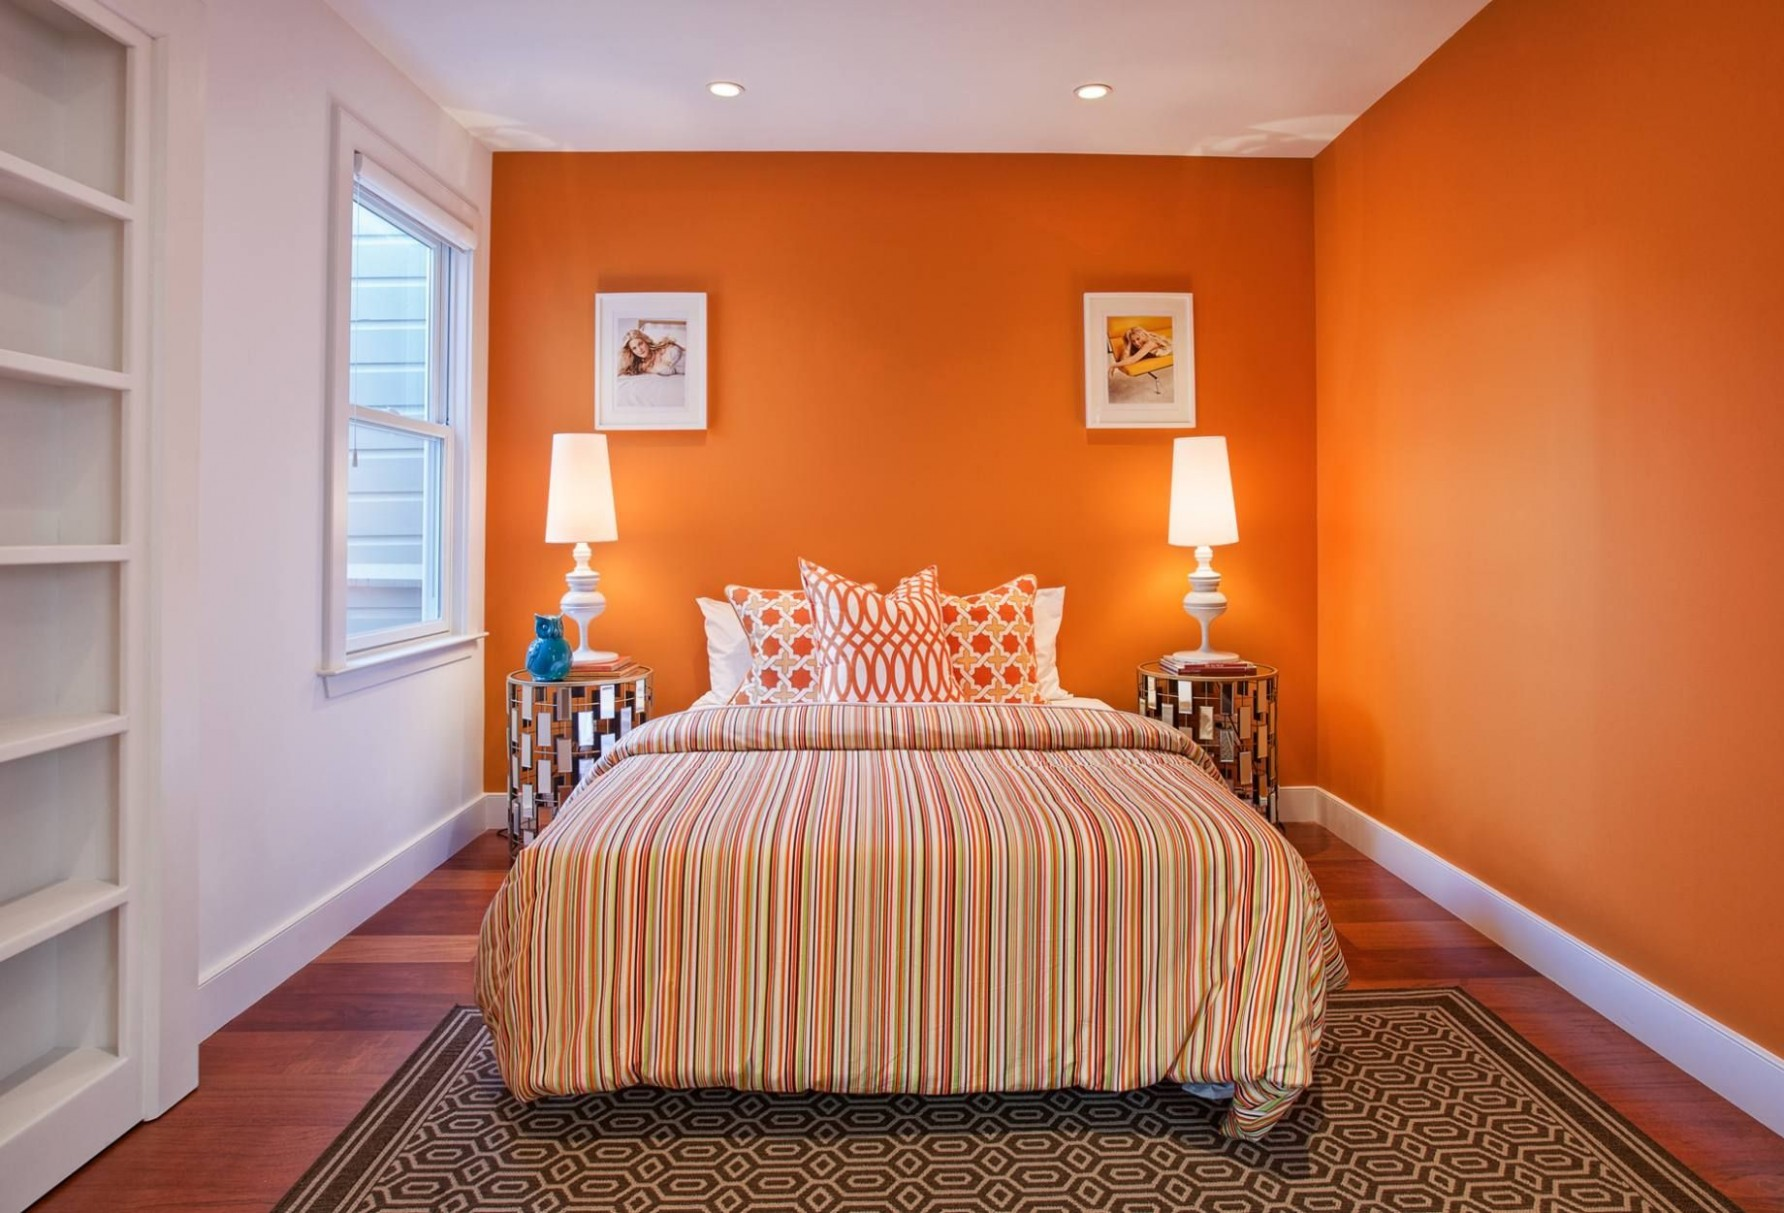 11 Refreshing Orange Bedroom Designs  Orange bedroom walls  - Bedroom Ideas Orange